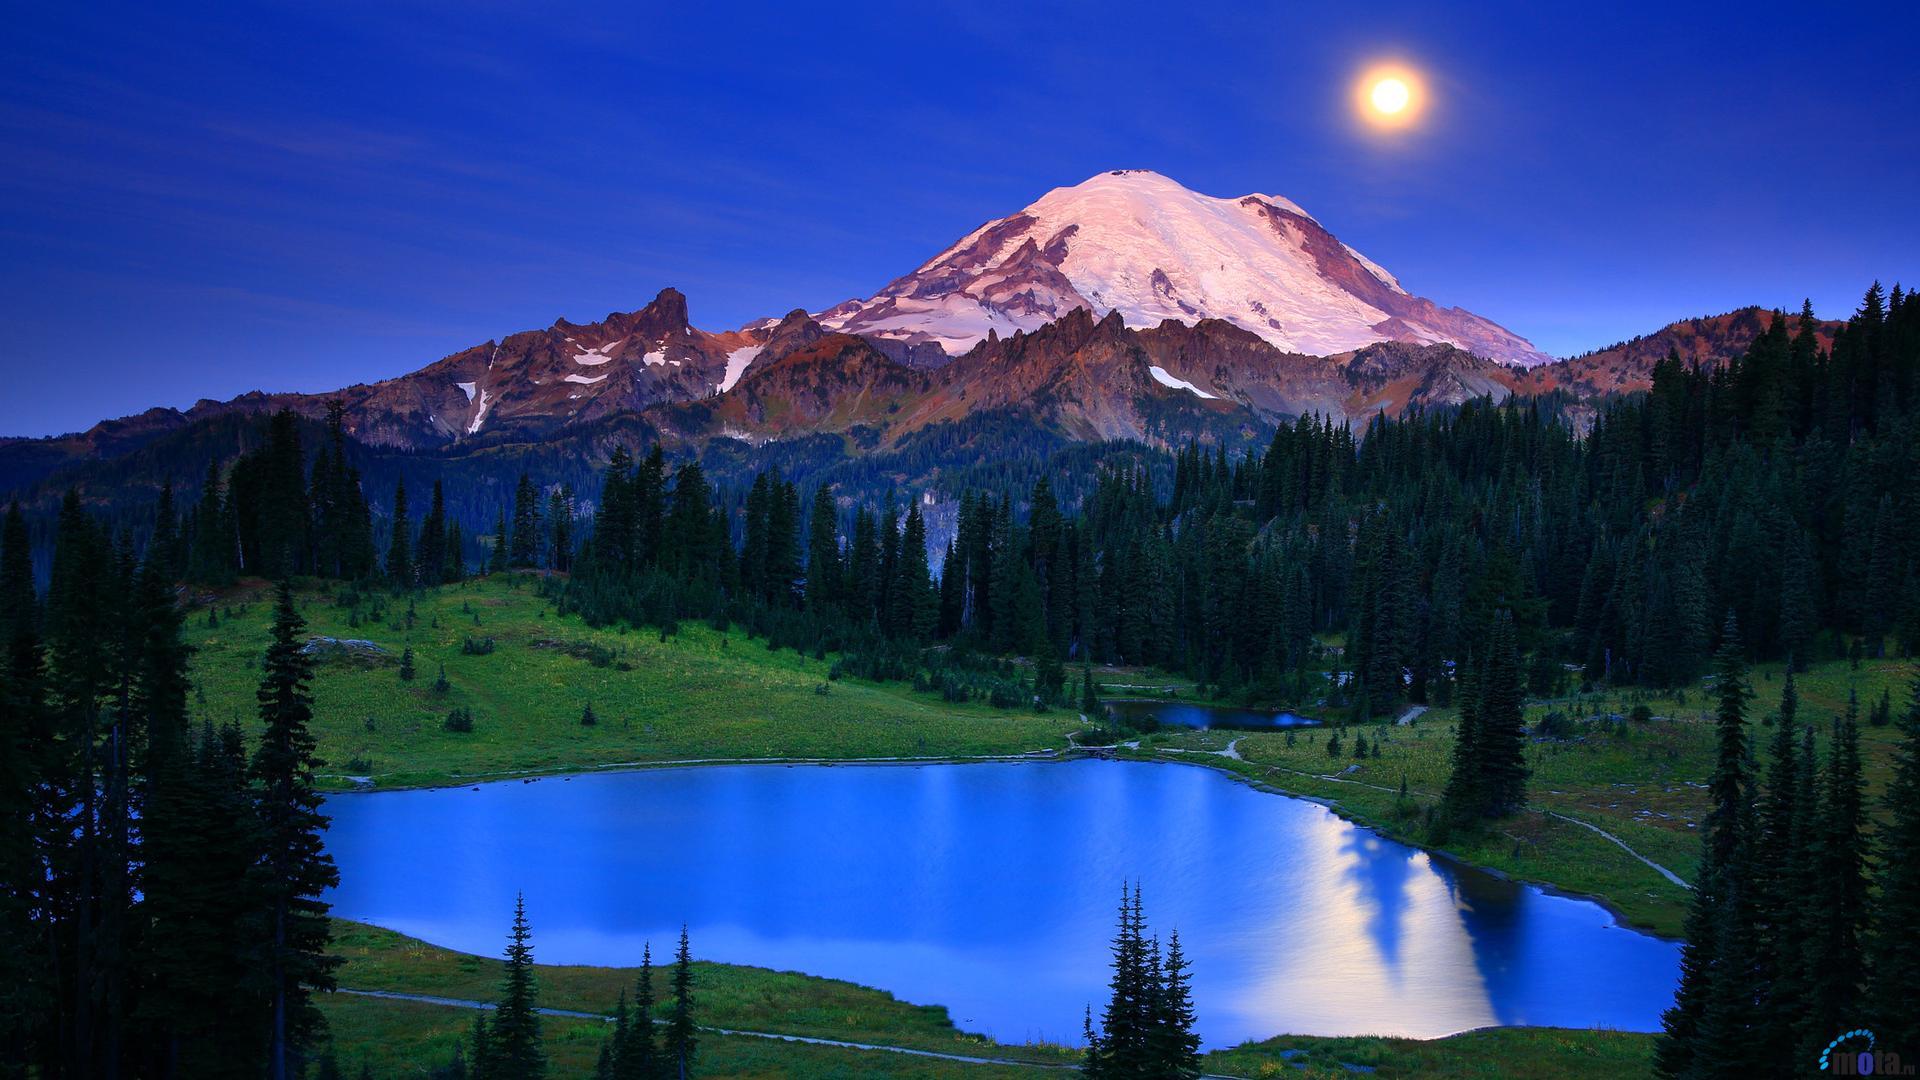 Download Wallpaper Mount Rainier National Park 1920x1080